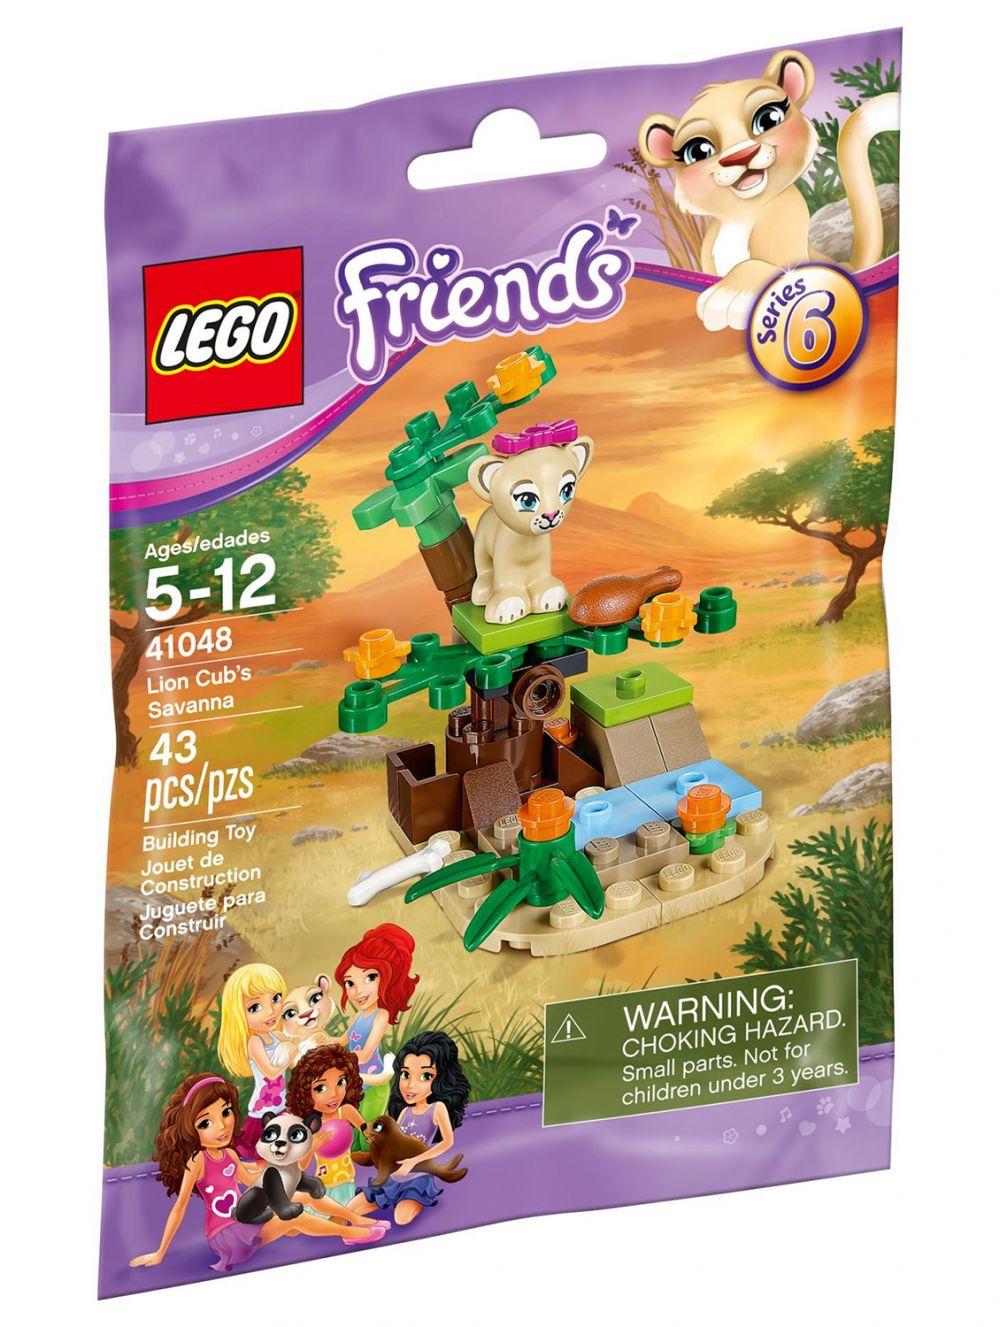 Friends 41048 Savane La Lego Lionceau Du iOPXwklZuT